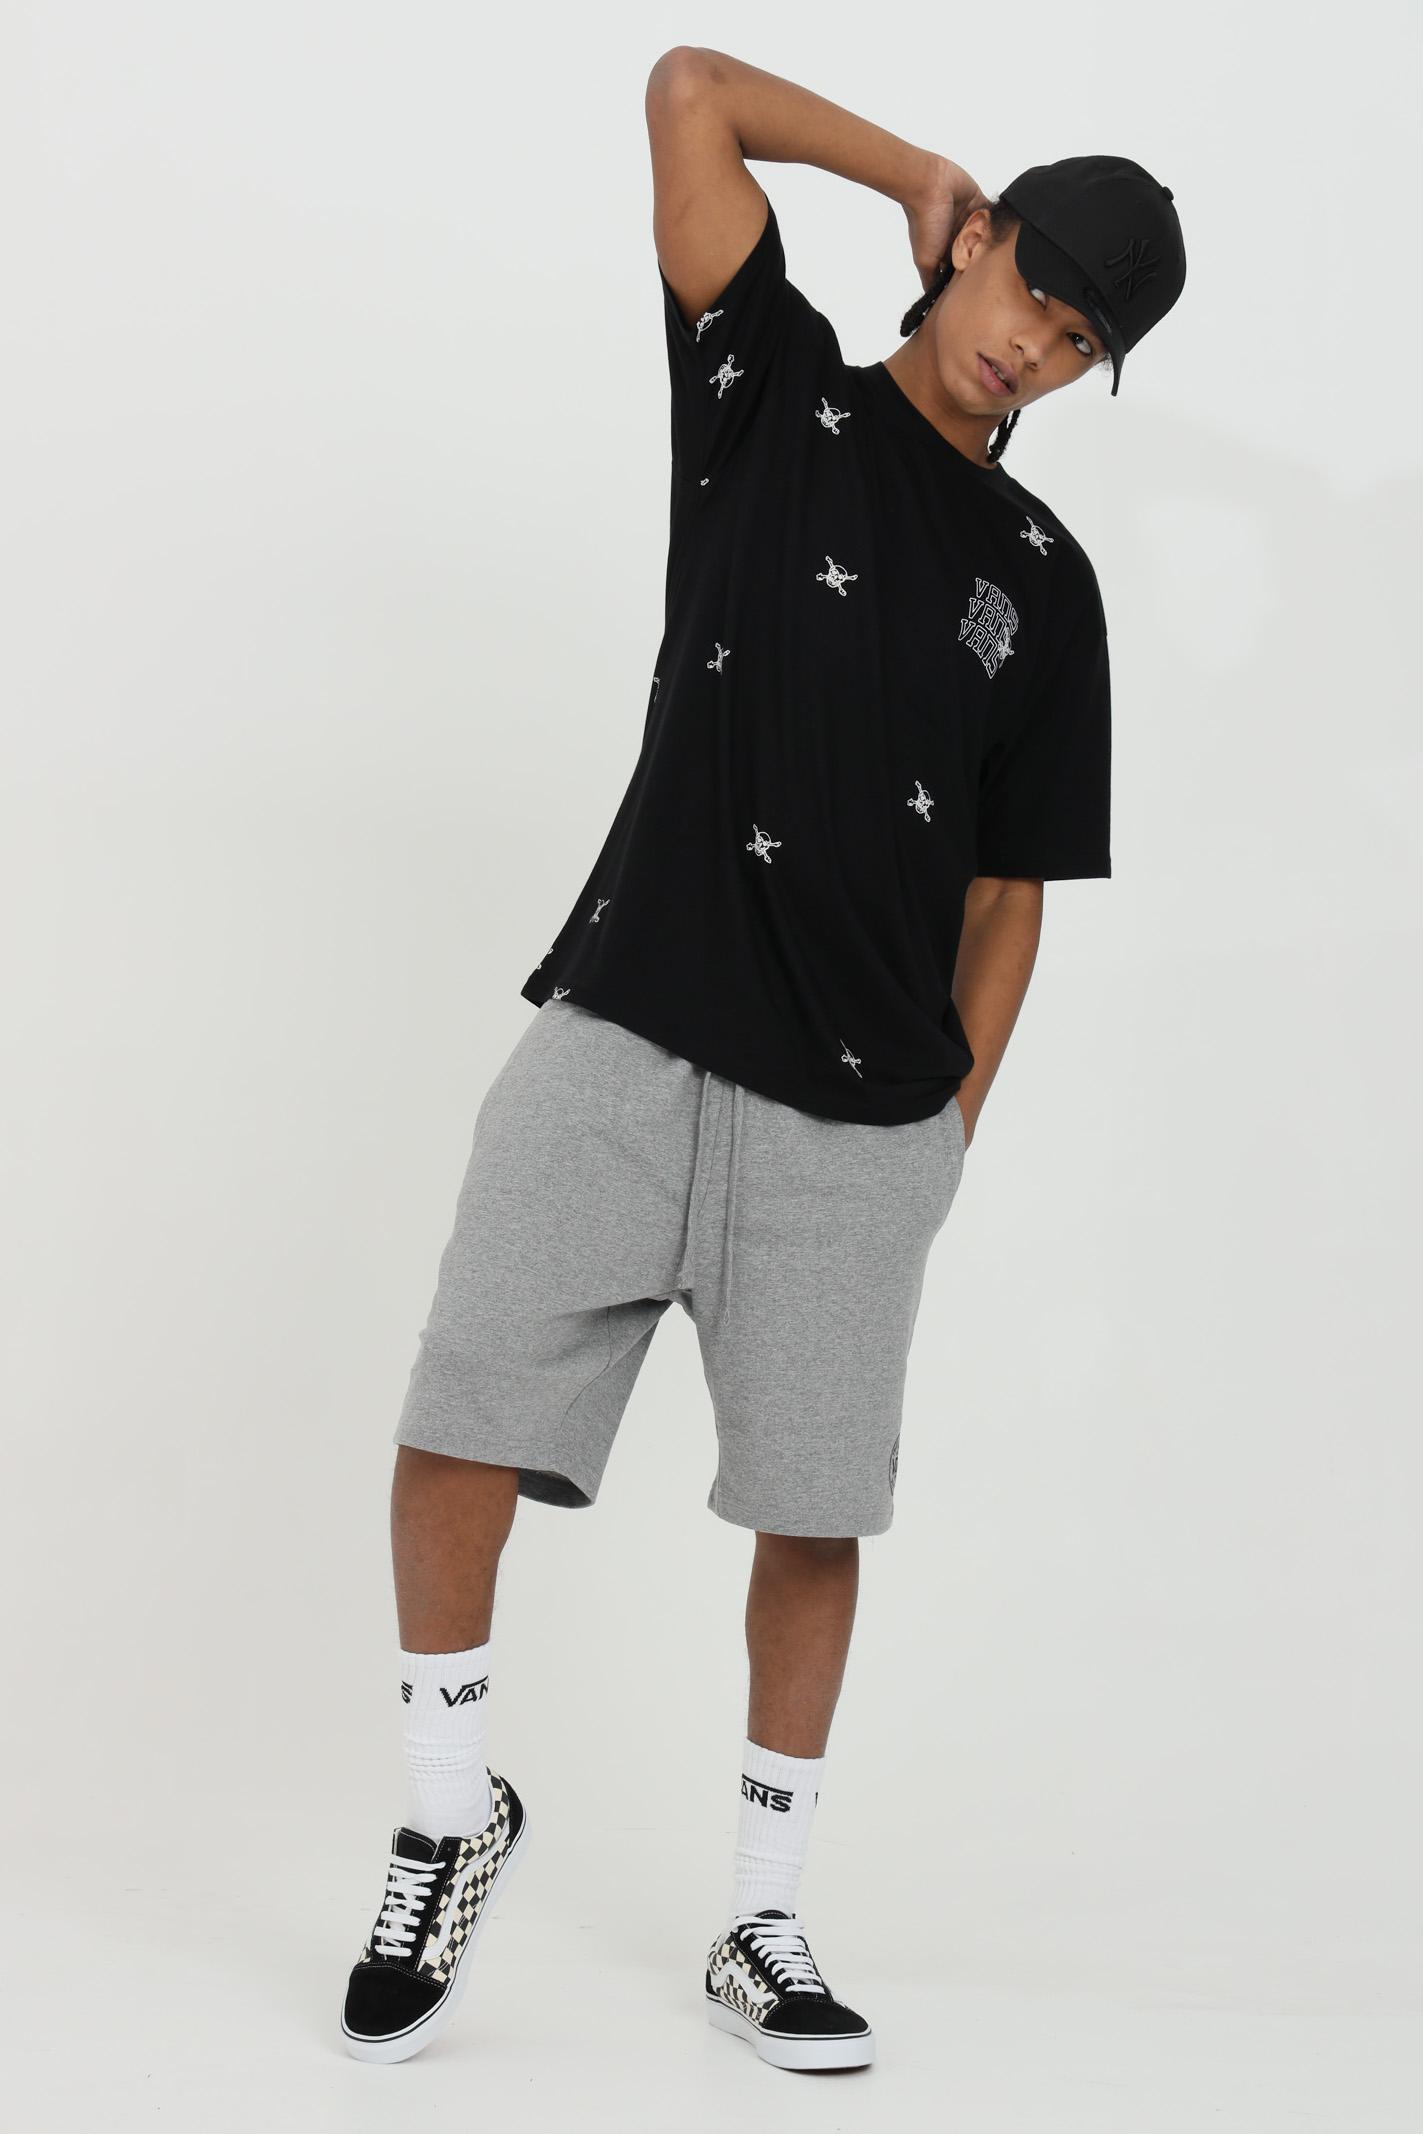 Black t-shirt with allover skull print, modello basic with short sleeve. Vans VANS | T-shirt | VN0A54C6BLK1BLK1